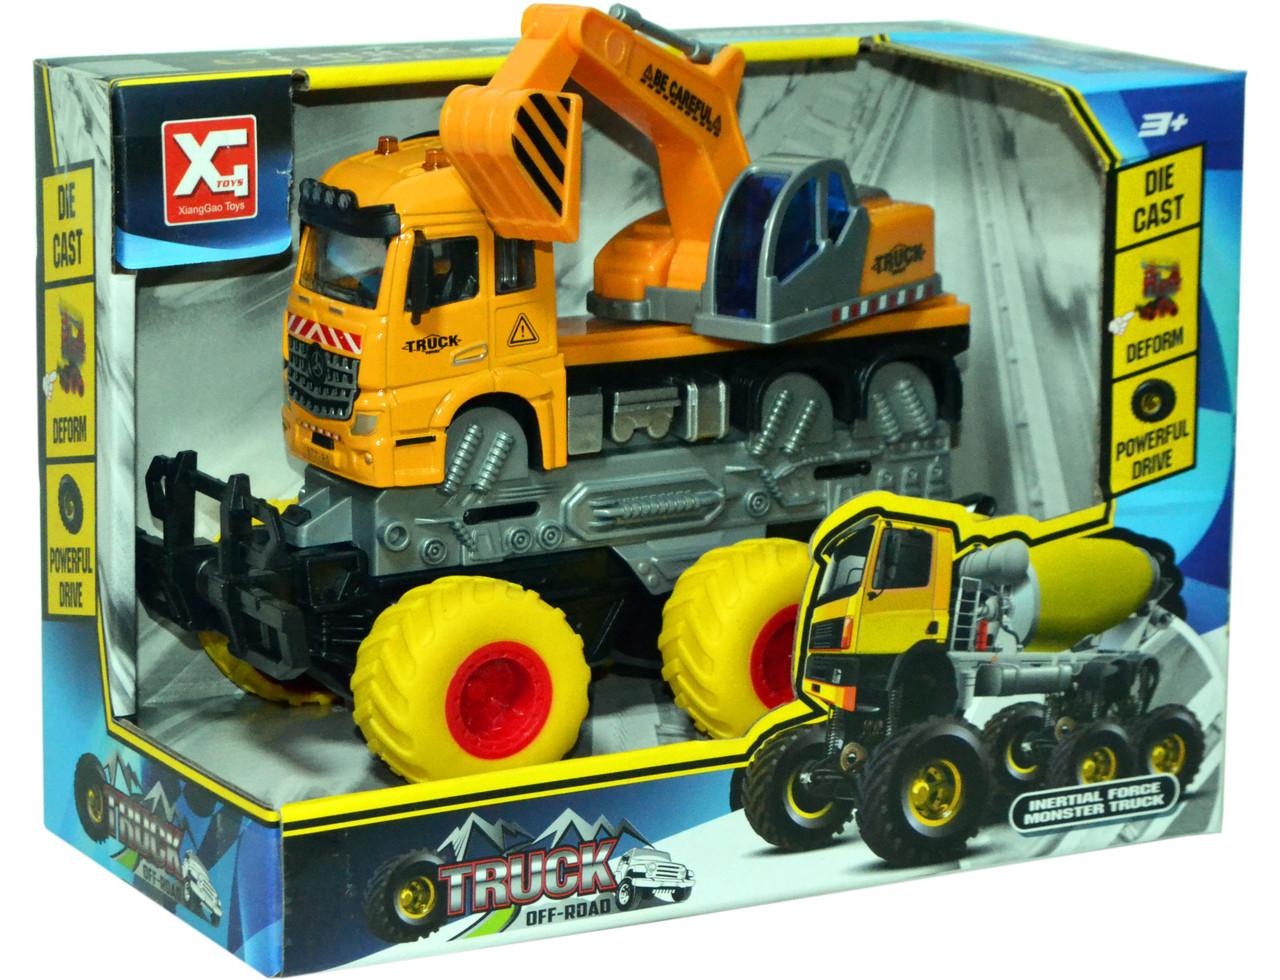 Xg878-A62ABC Монстер-Строительный 6 колес,3 вида Truck OFFROAD, 24*18см